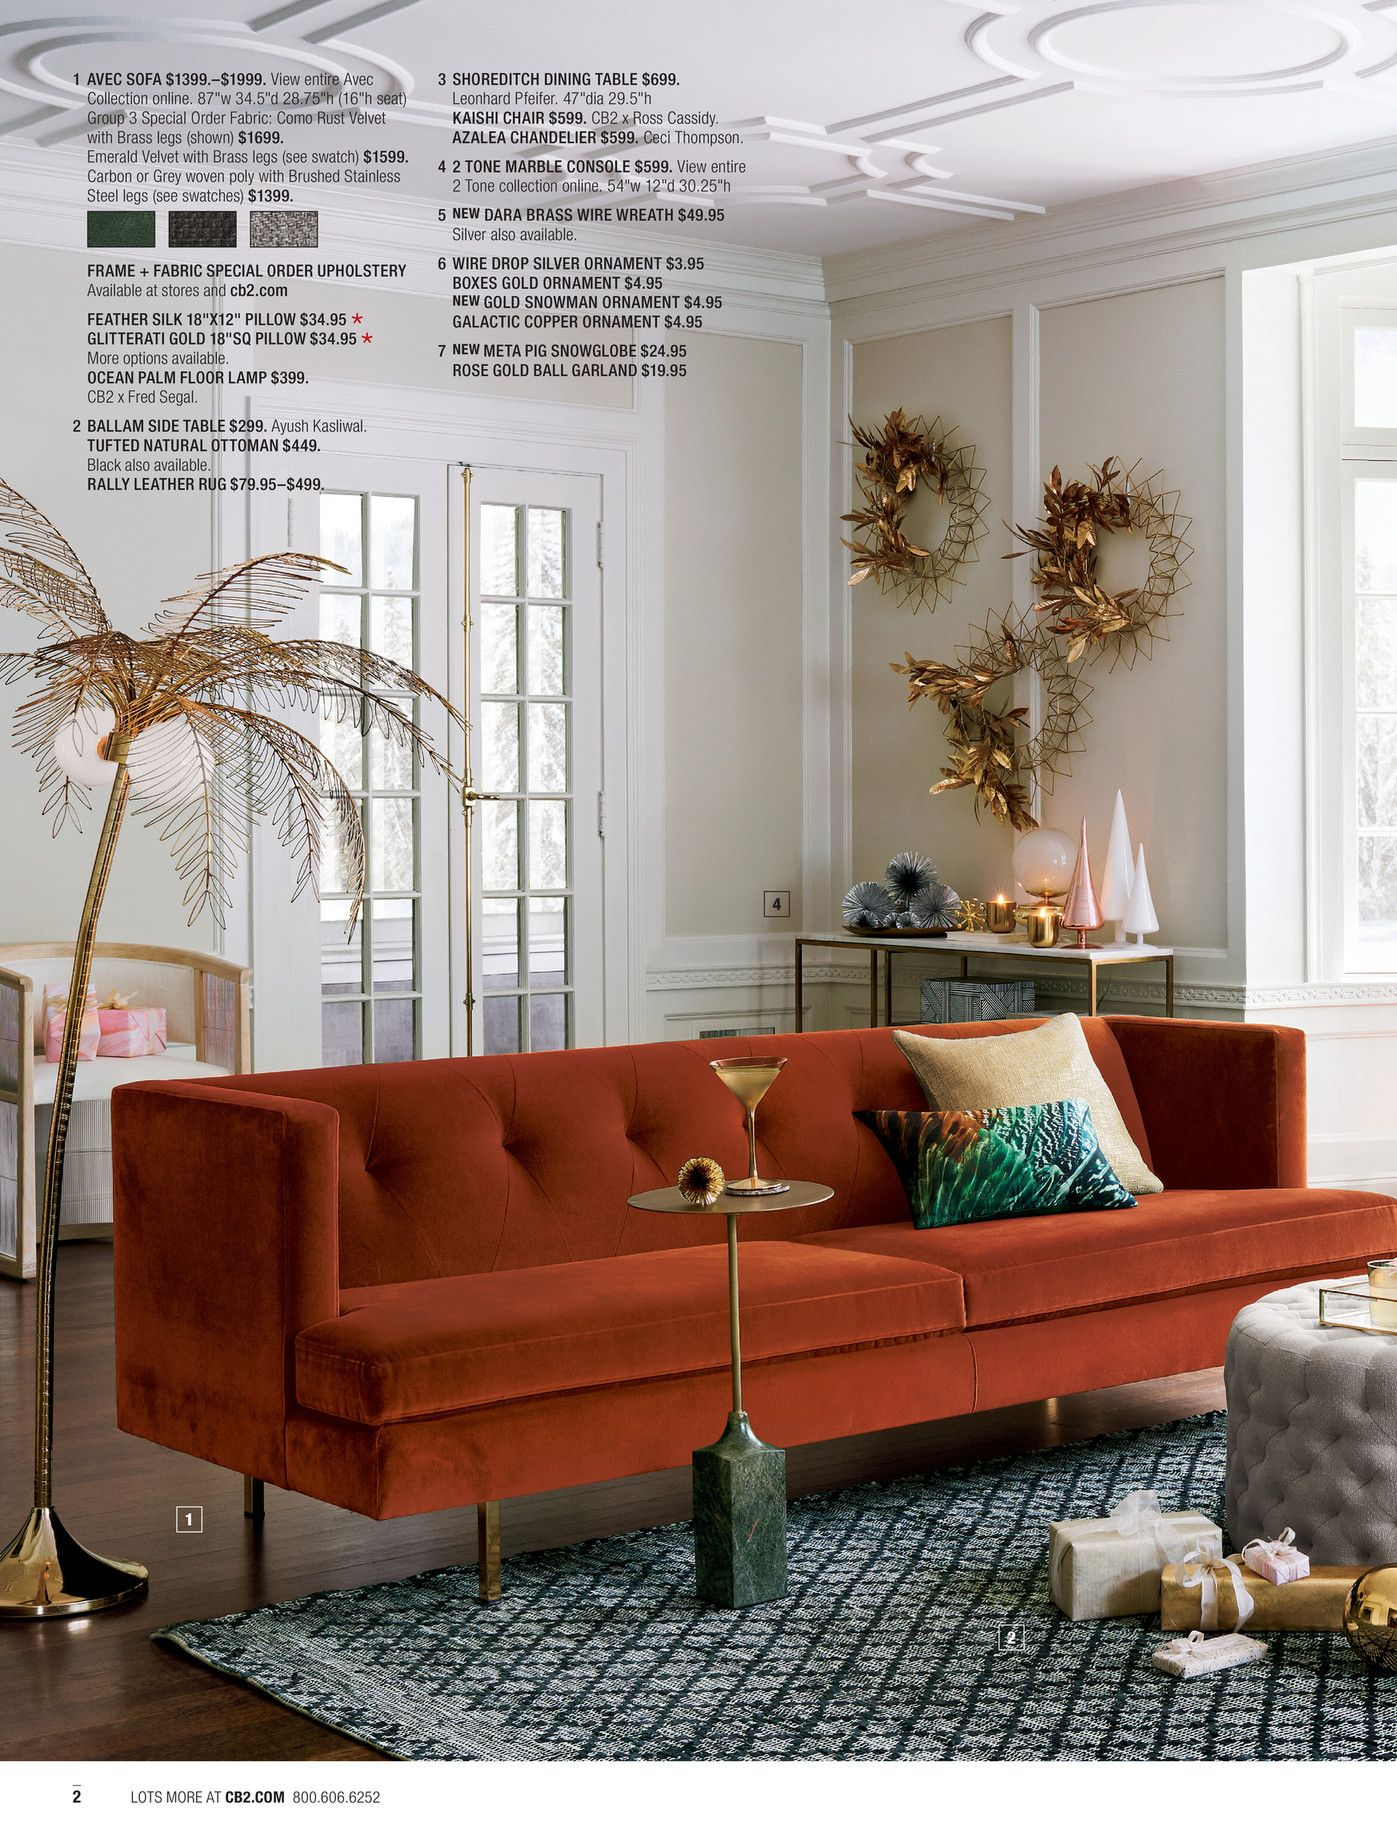 November Catalog 2017 | Flooring, Tree floor lamp, Cozy house